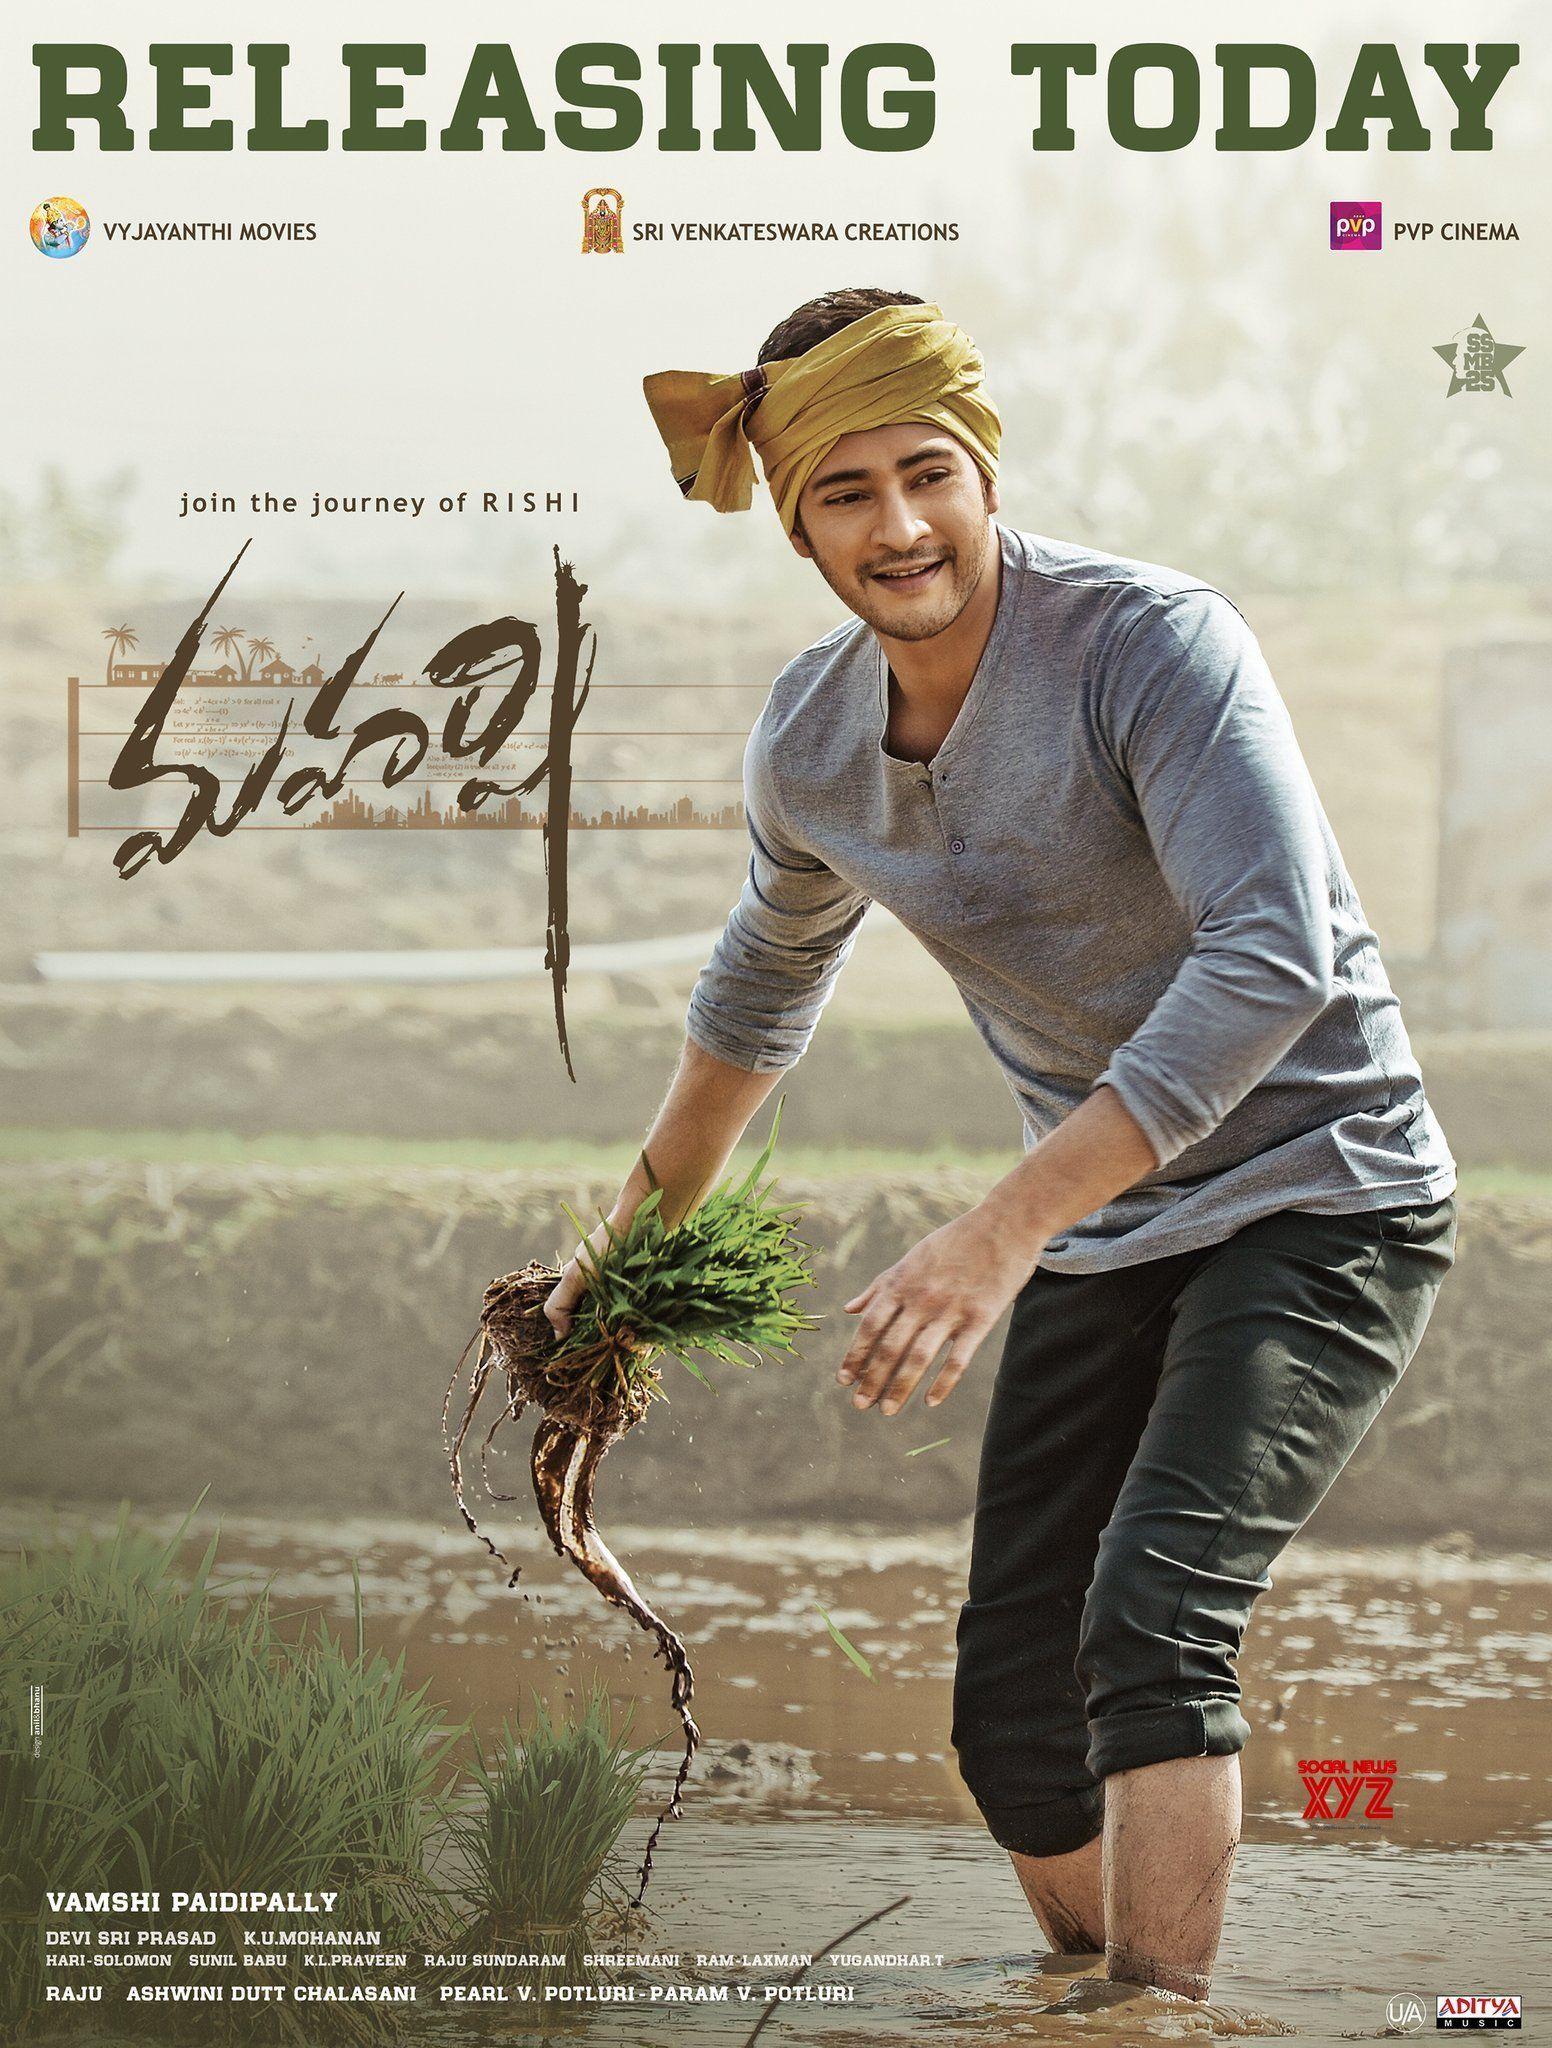 maharshi 2019 telugu movie free download